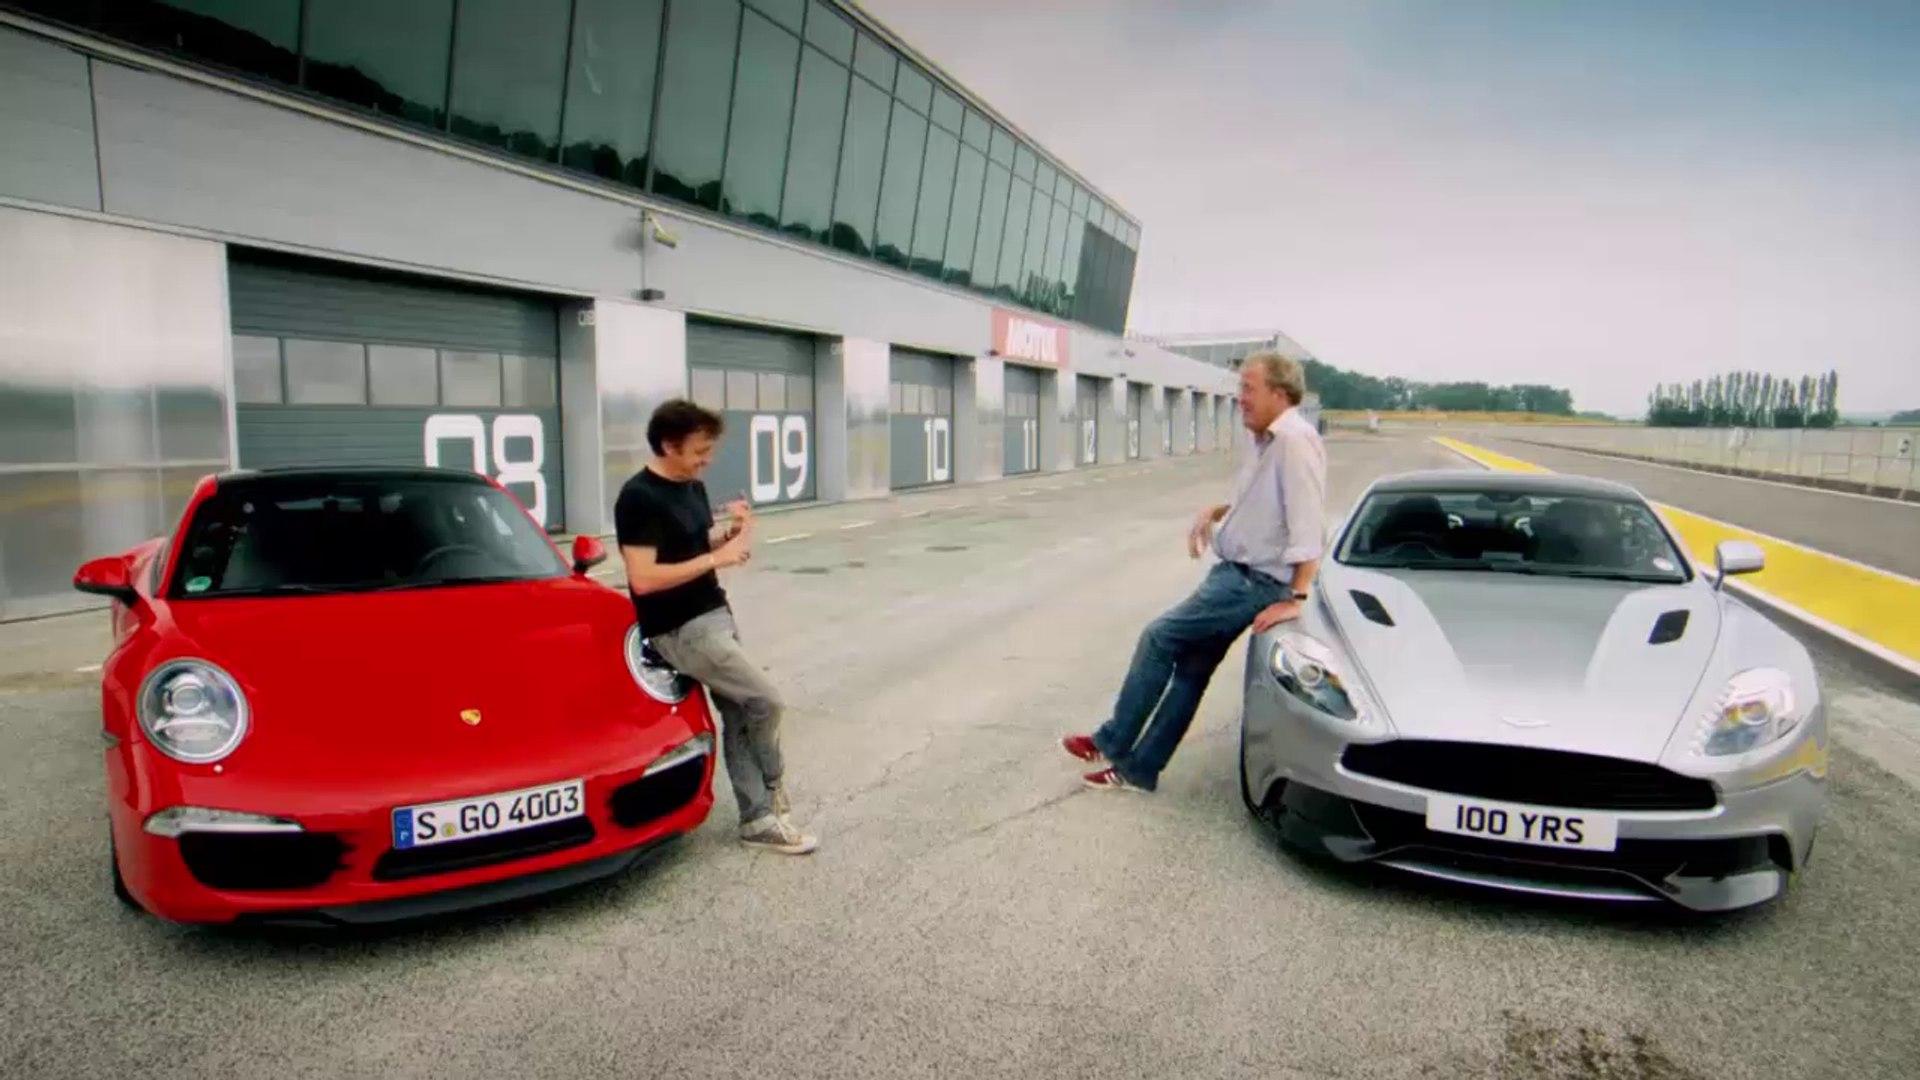 Porsche 911 Carrera S Vs Aston Martin Vanquish Top Gear Bbc Video Dailymotion